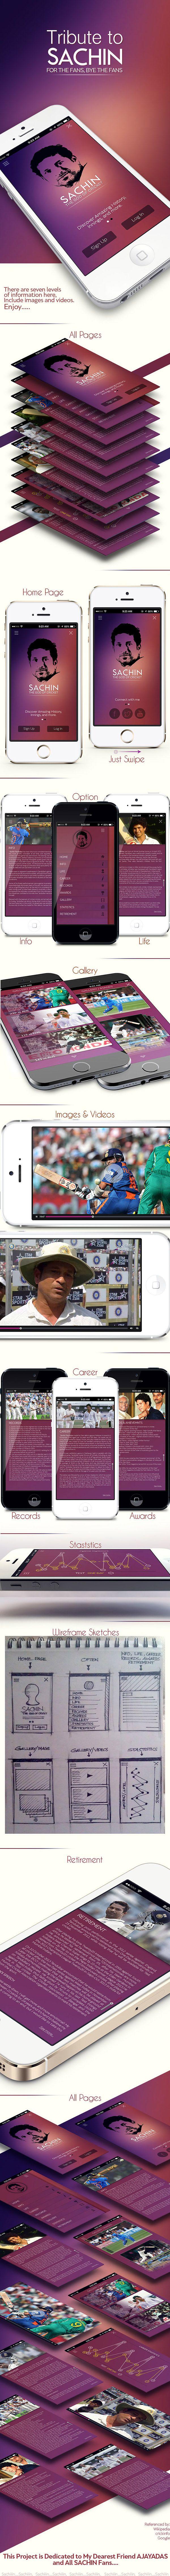 SACHIN THE GOD OF CRICKET mobile app on Behance